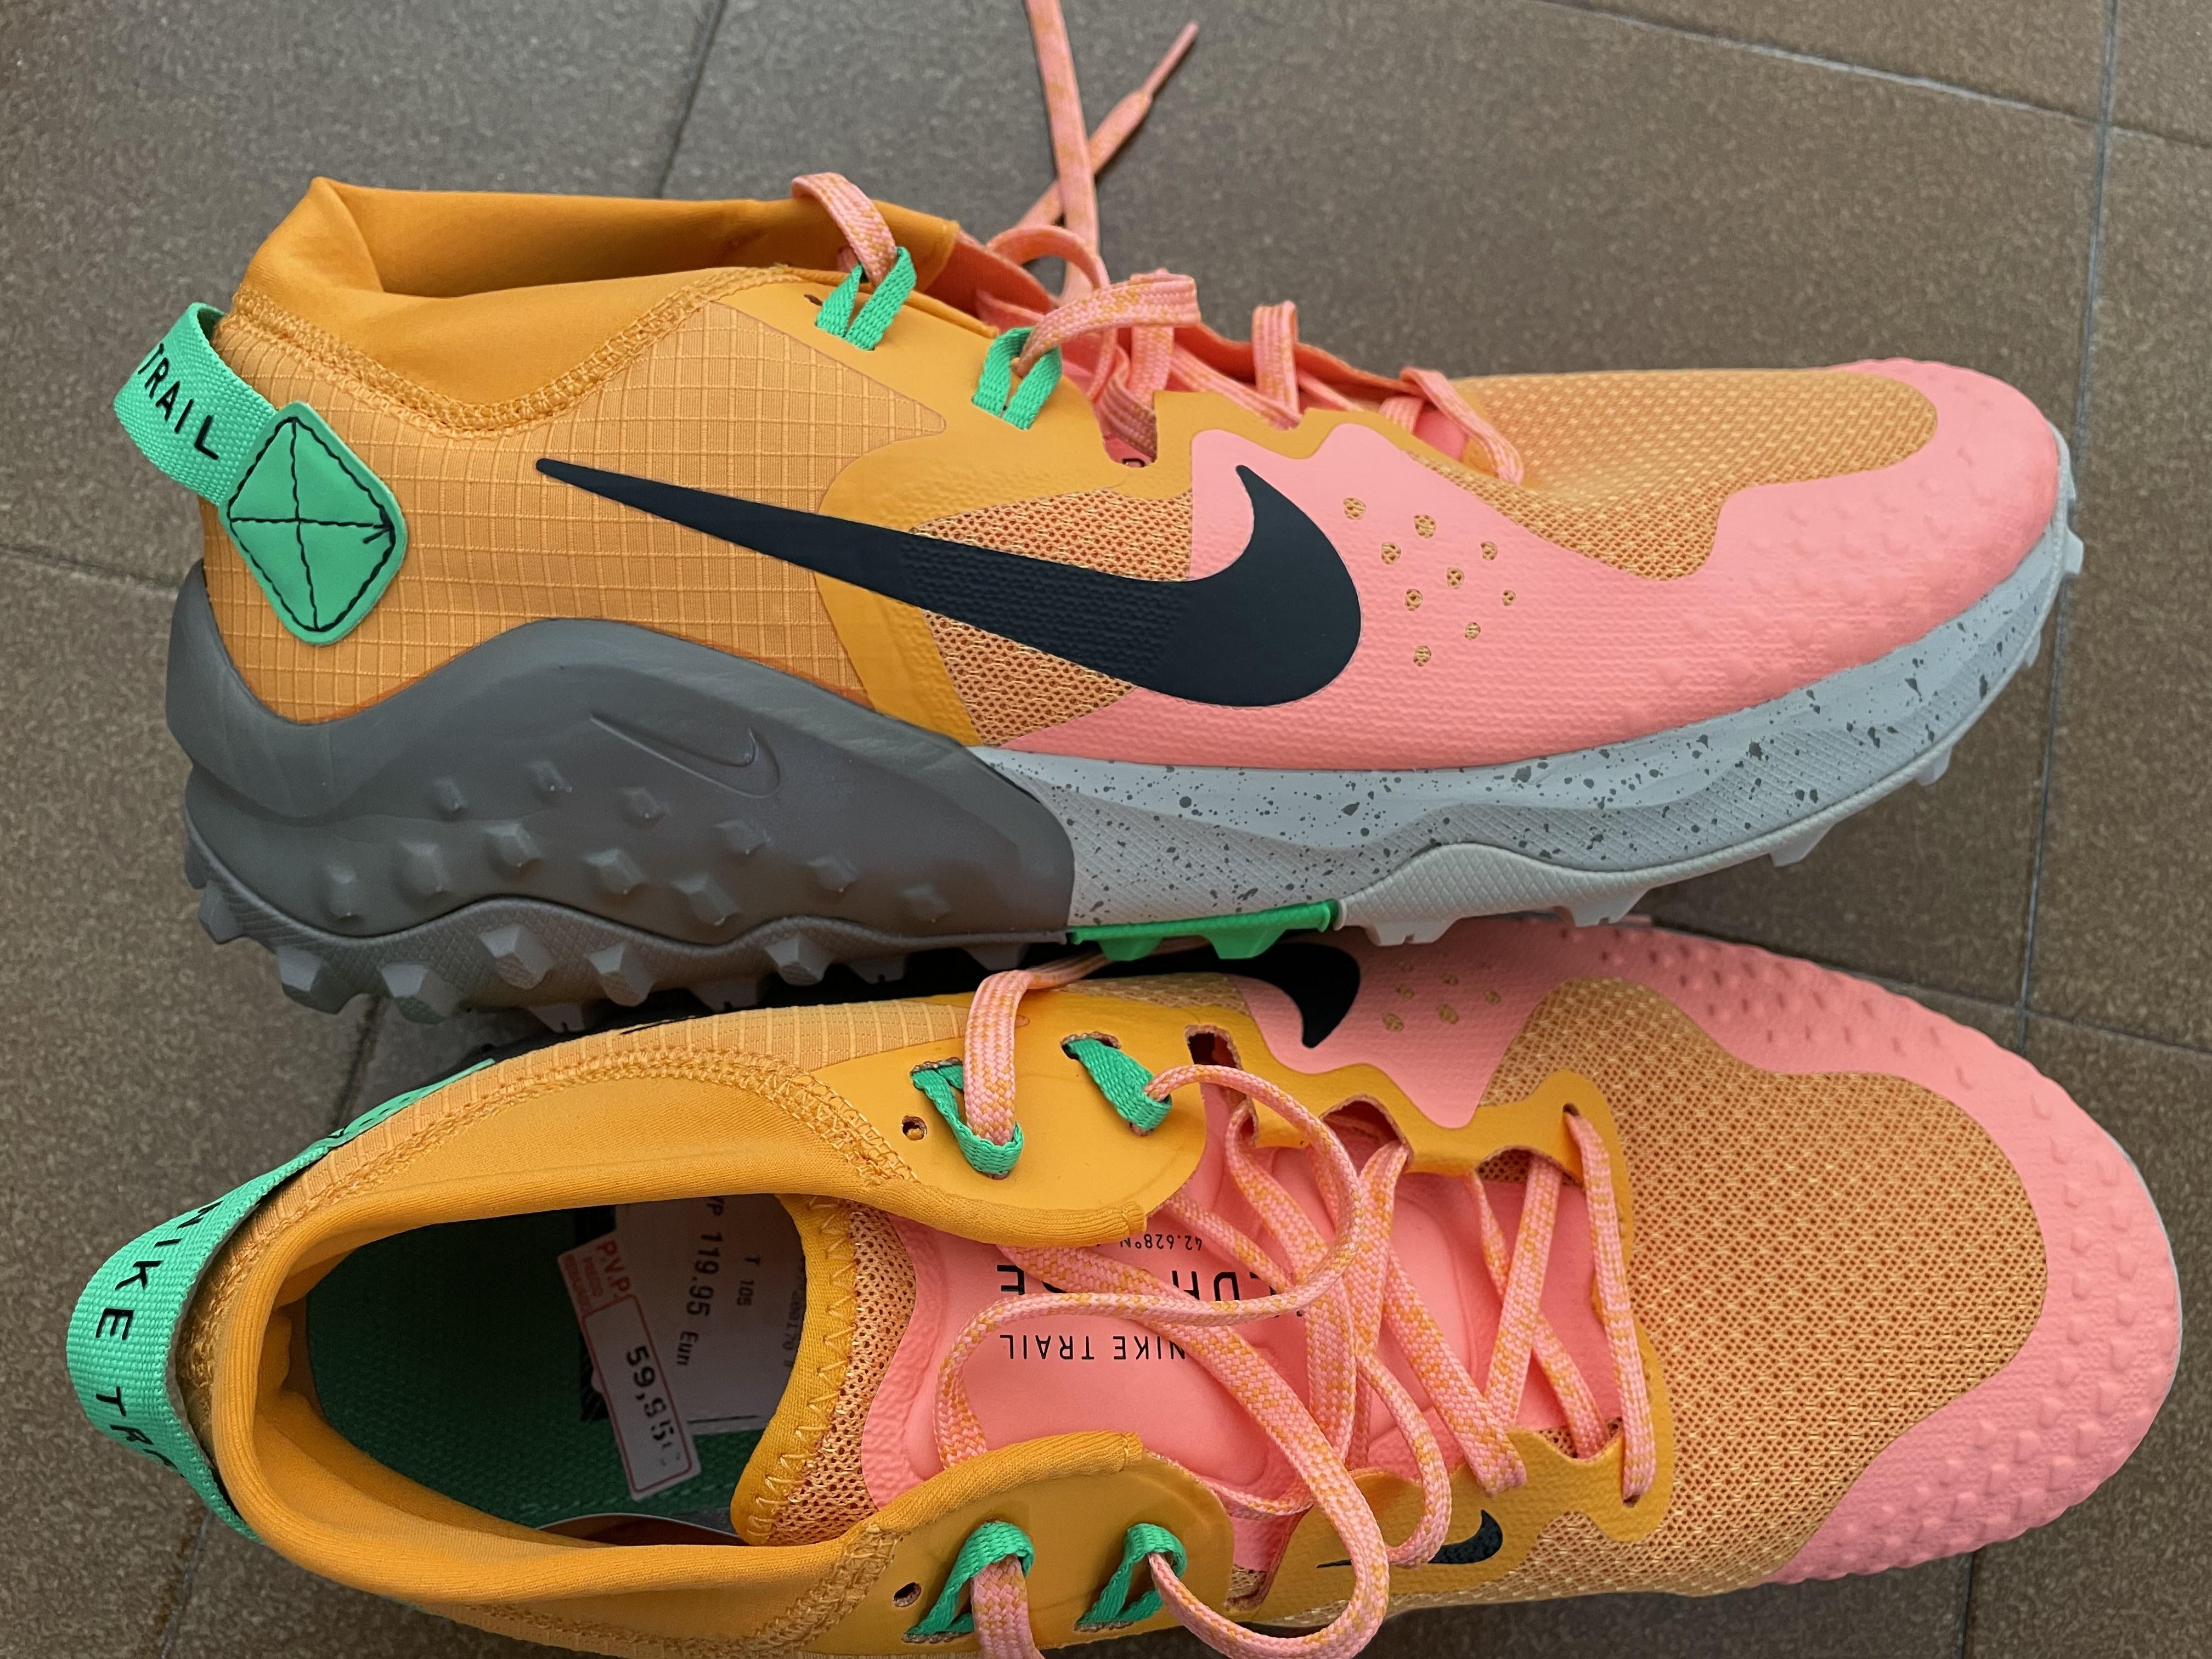 Zapatillas Nike Trail, Corte Ingles de La Coruña